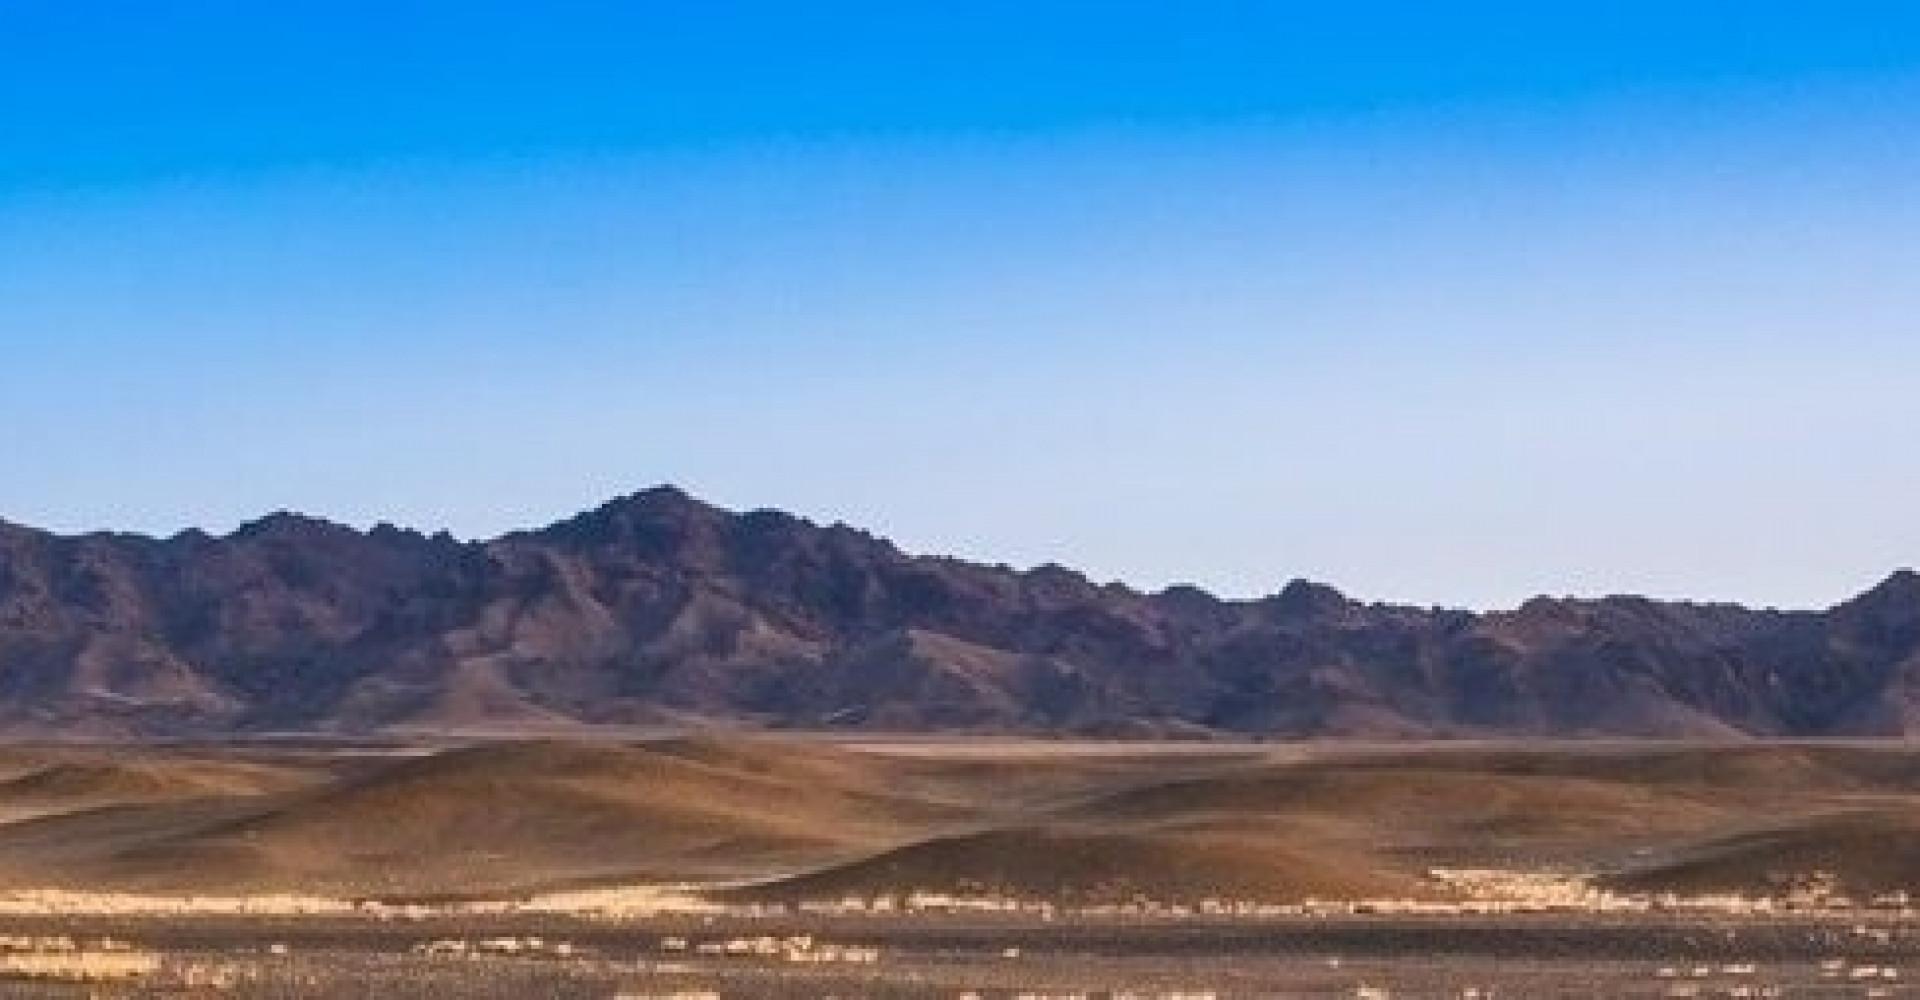 Nemegt Mountain